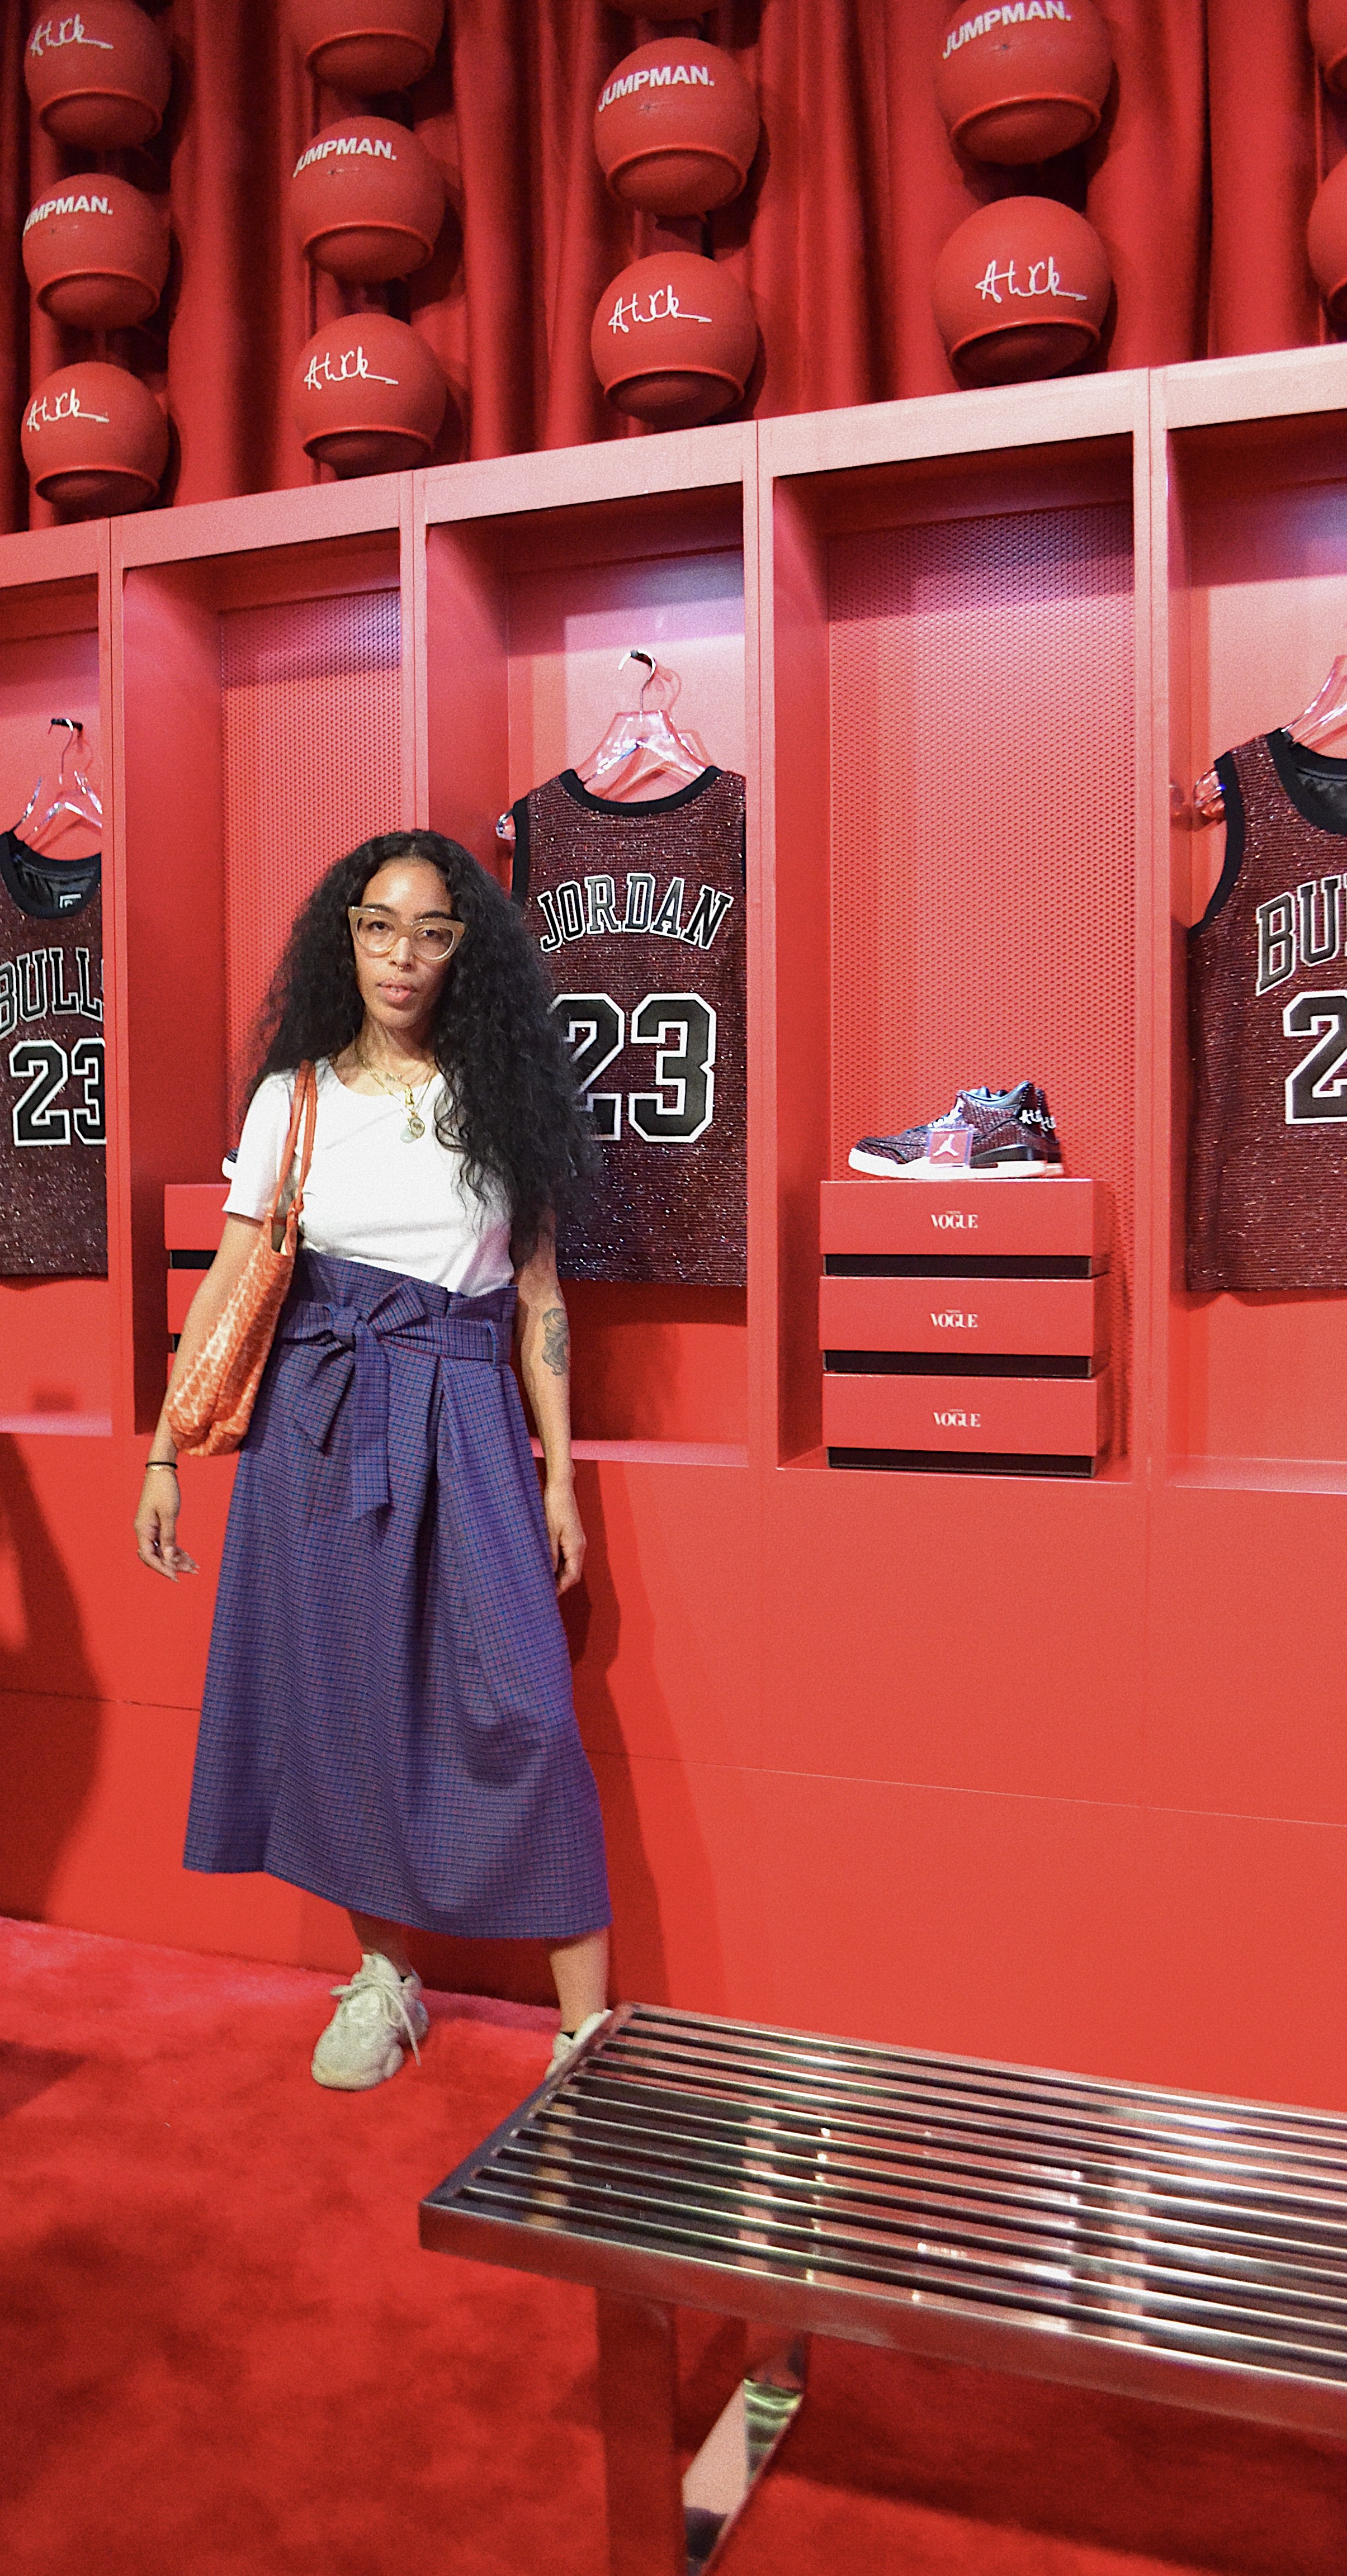 Skirt: Zara, Sneakers: Yeezy